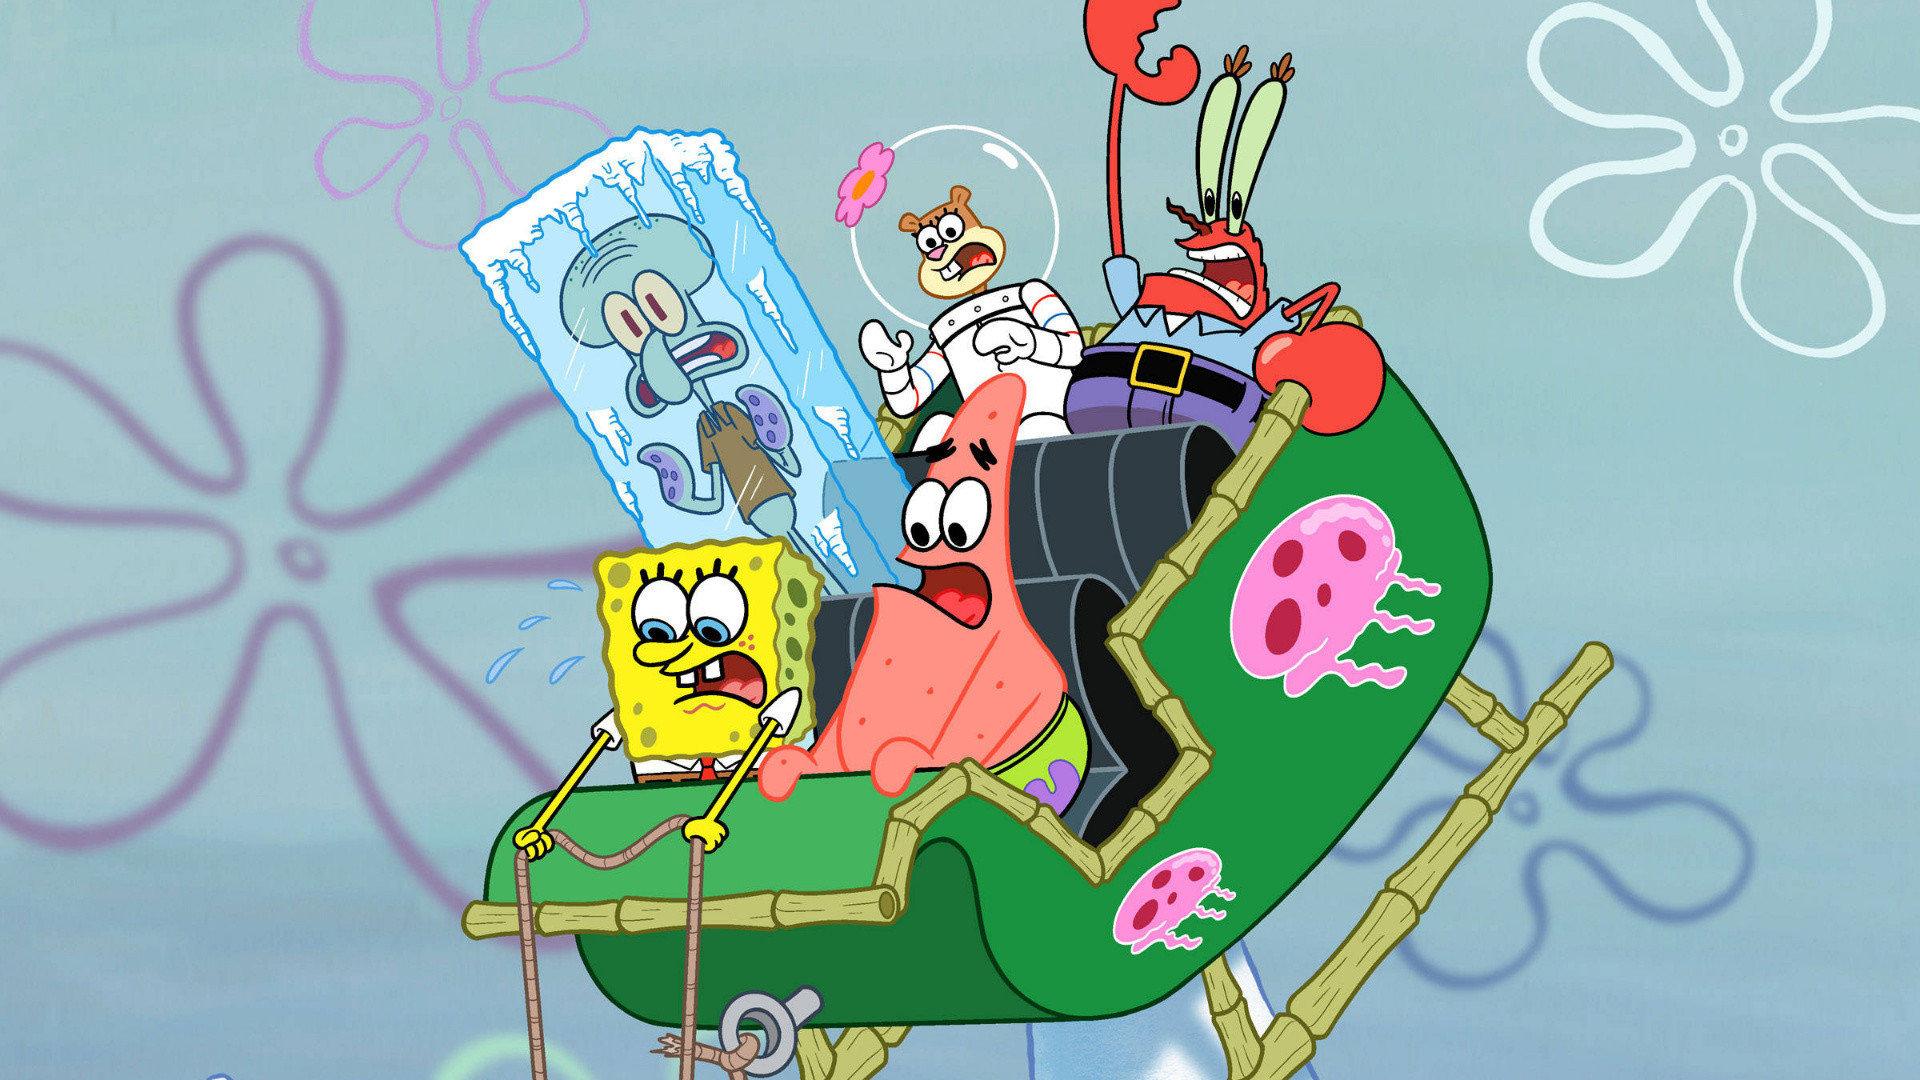 spongebob squarepants hd wallpaper 68436